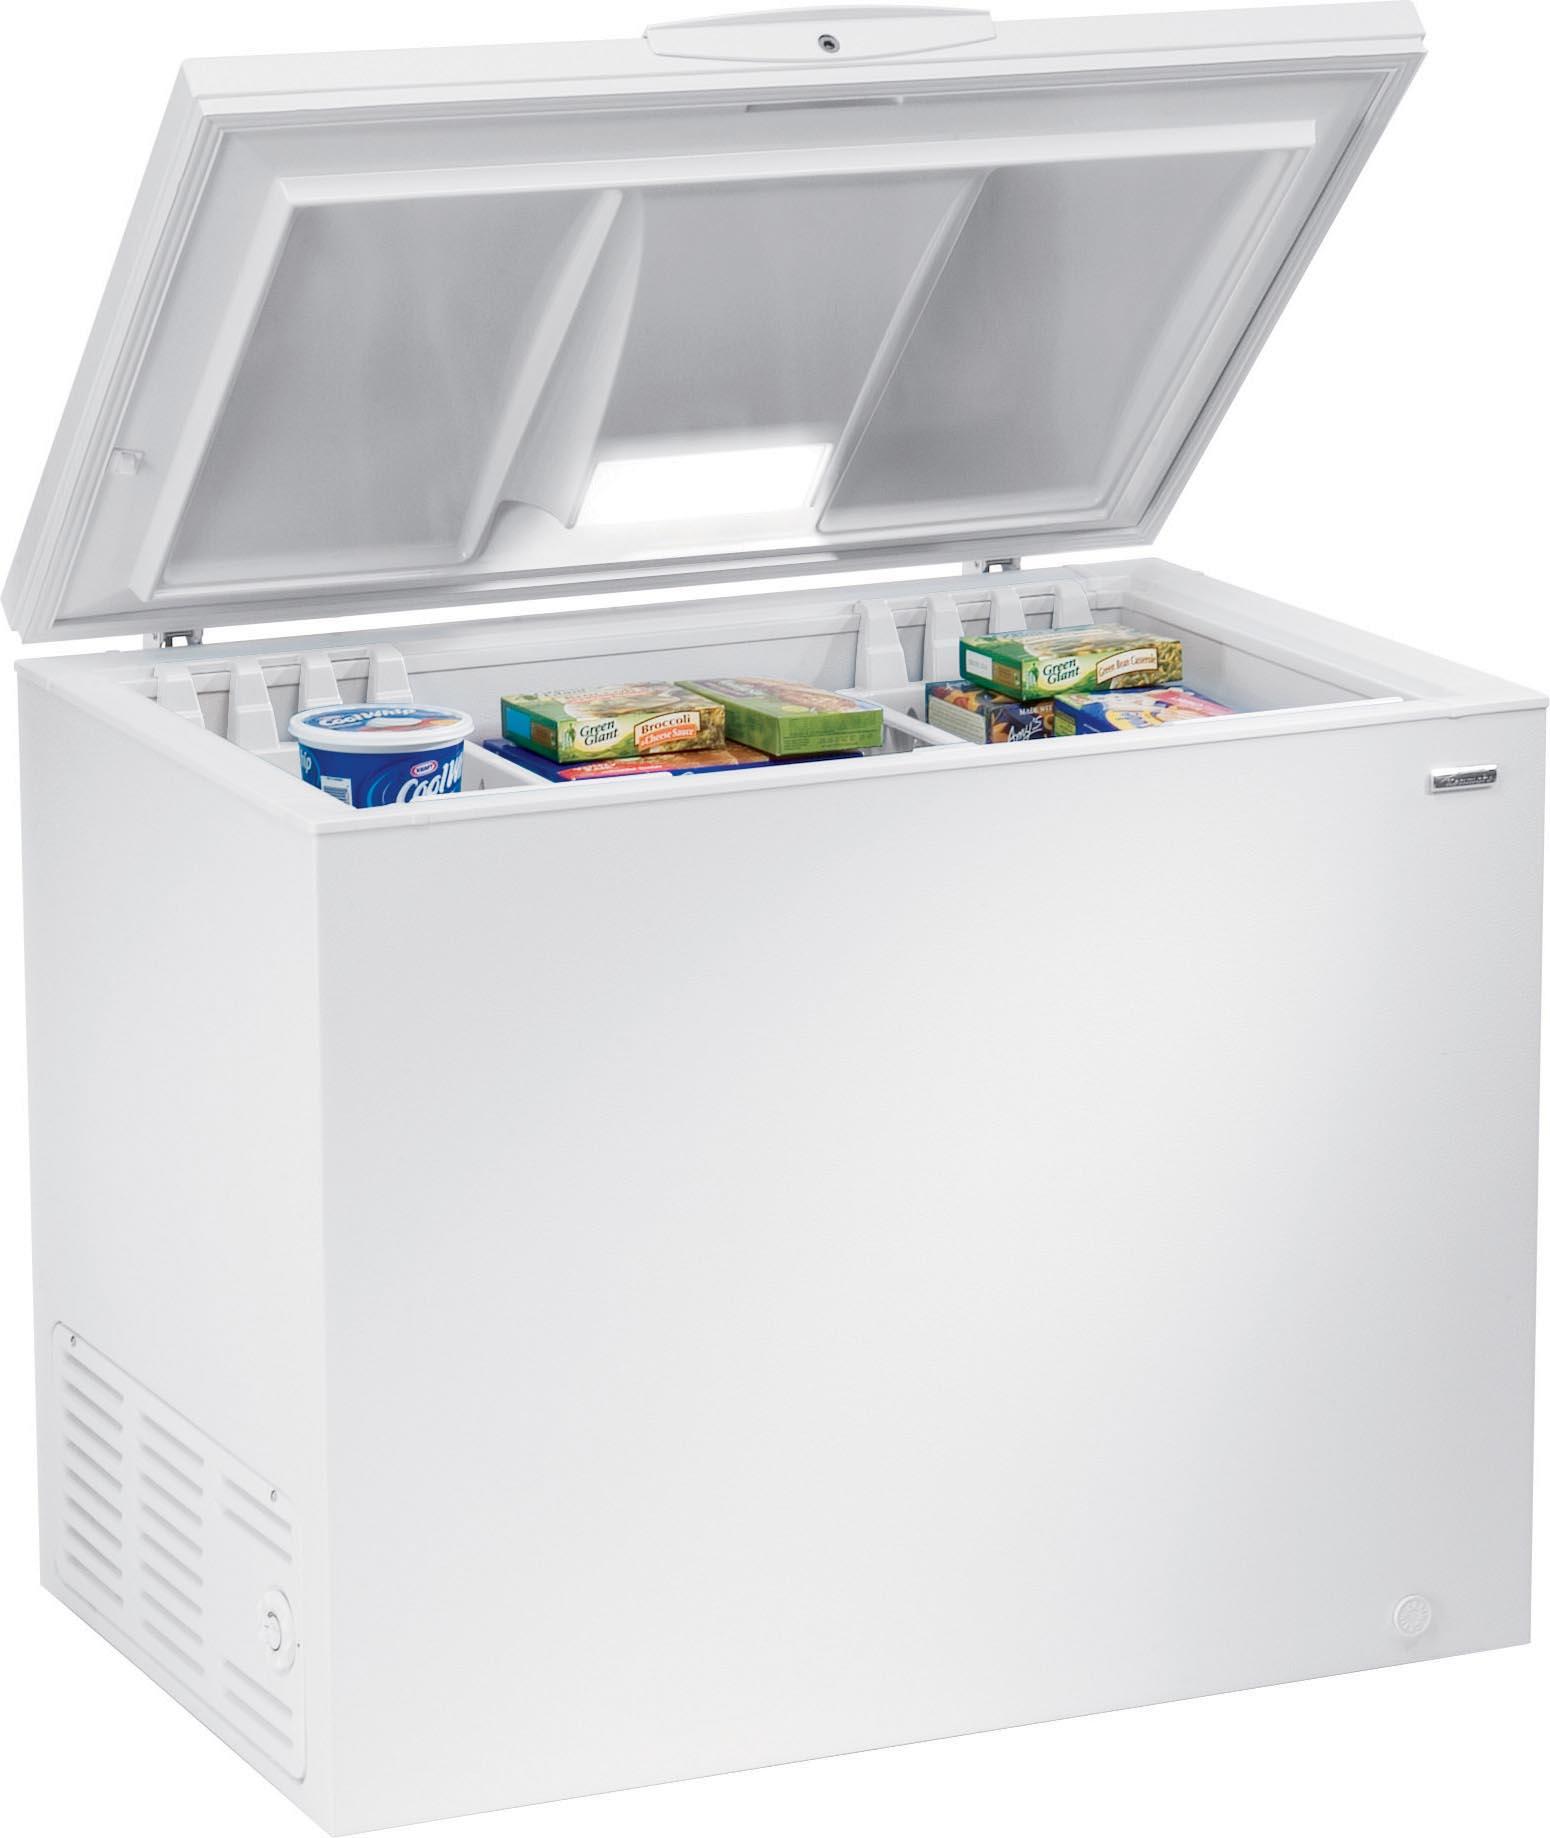 kenmore model 25316342101 chest freezer genuine parts kenmore freezer relays diagram kenmore chest freezer wiring diagram [ 1550 x 1838 Pixel ]